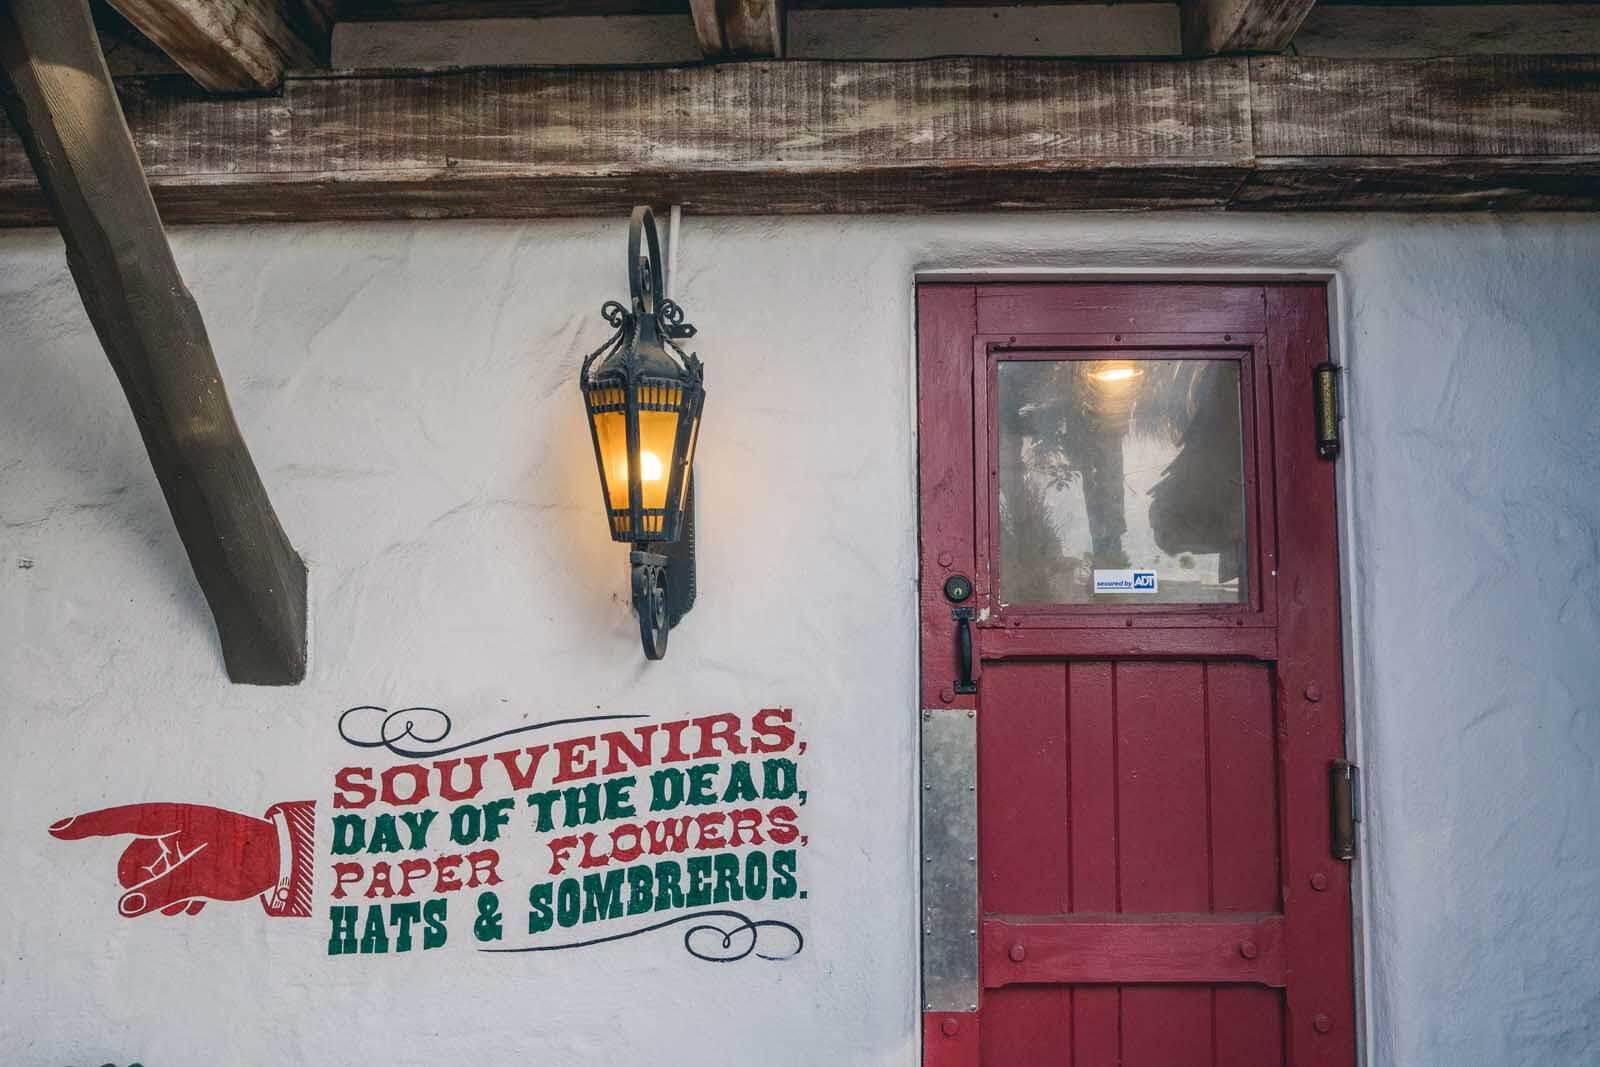 Fiesta de Reyes wall in Old Town San Diego